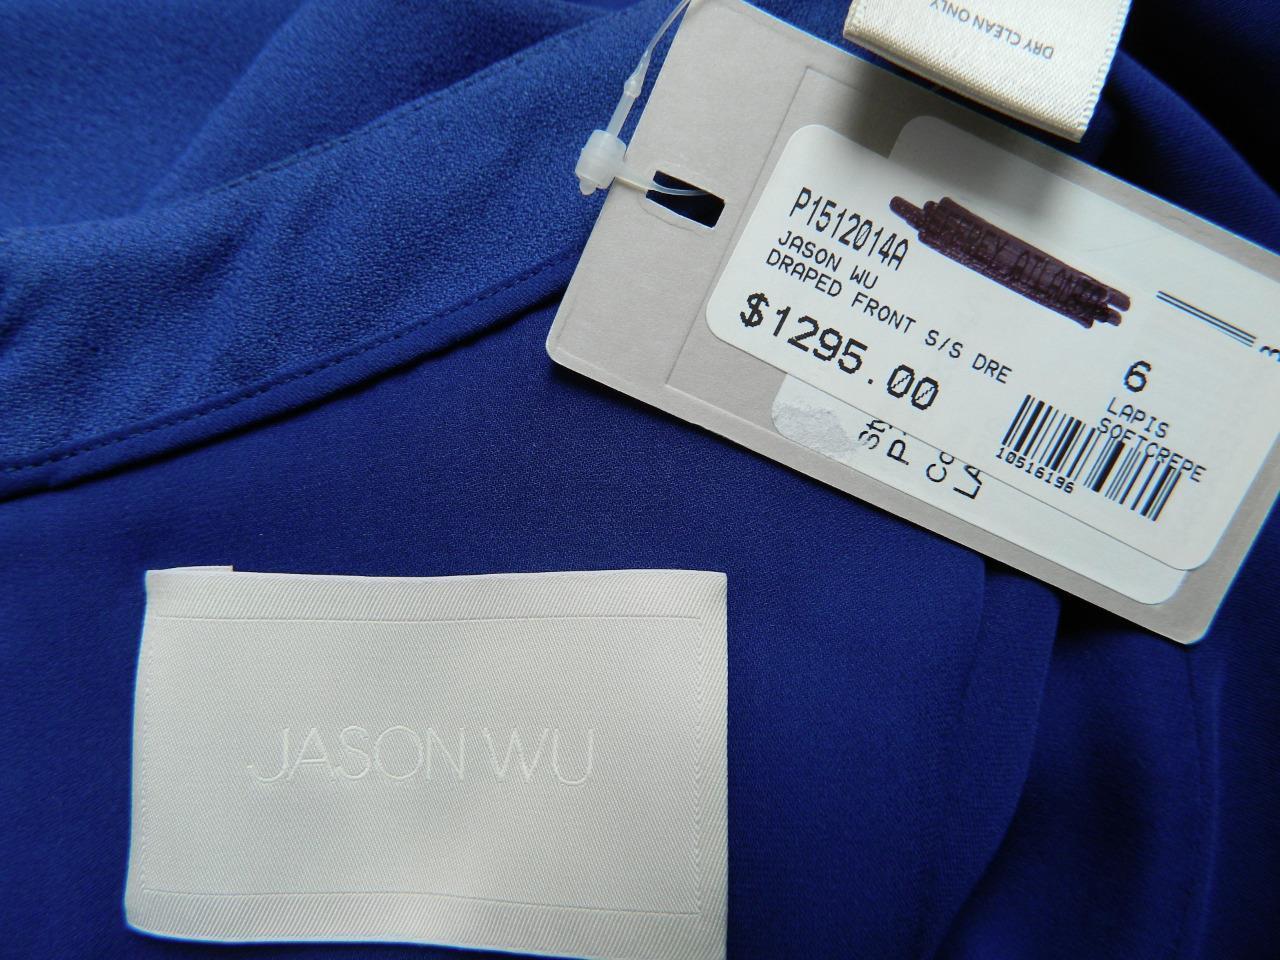 Jason Wu Dress Draped Front Flounce Lapis Blue Crepe Short Sleeve NWT $1295 6